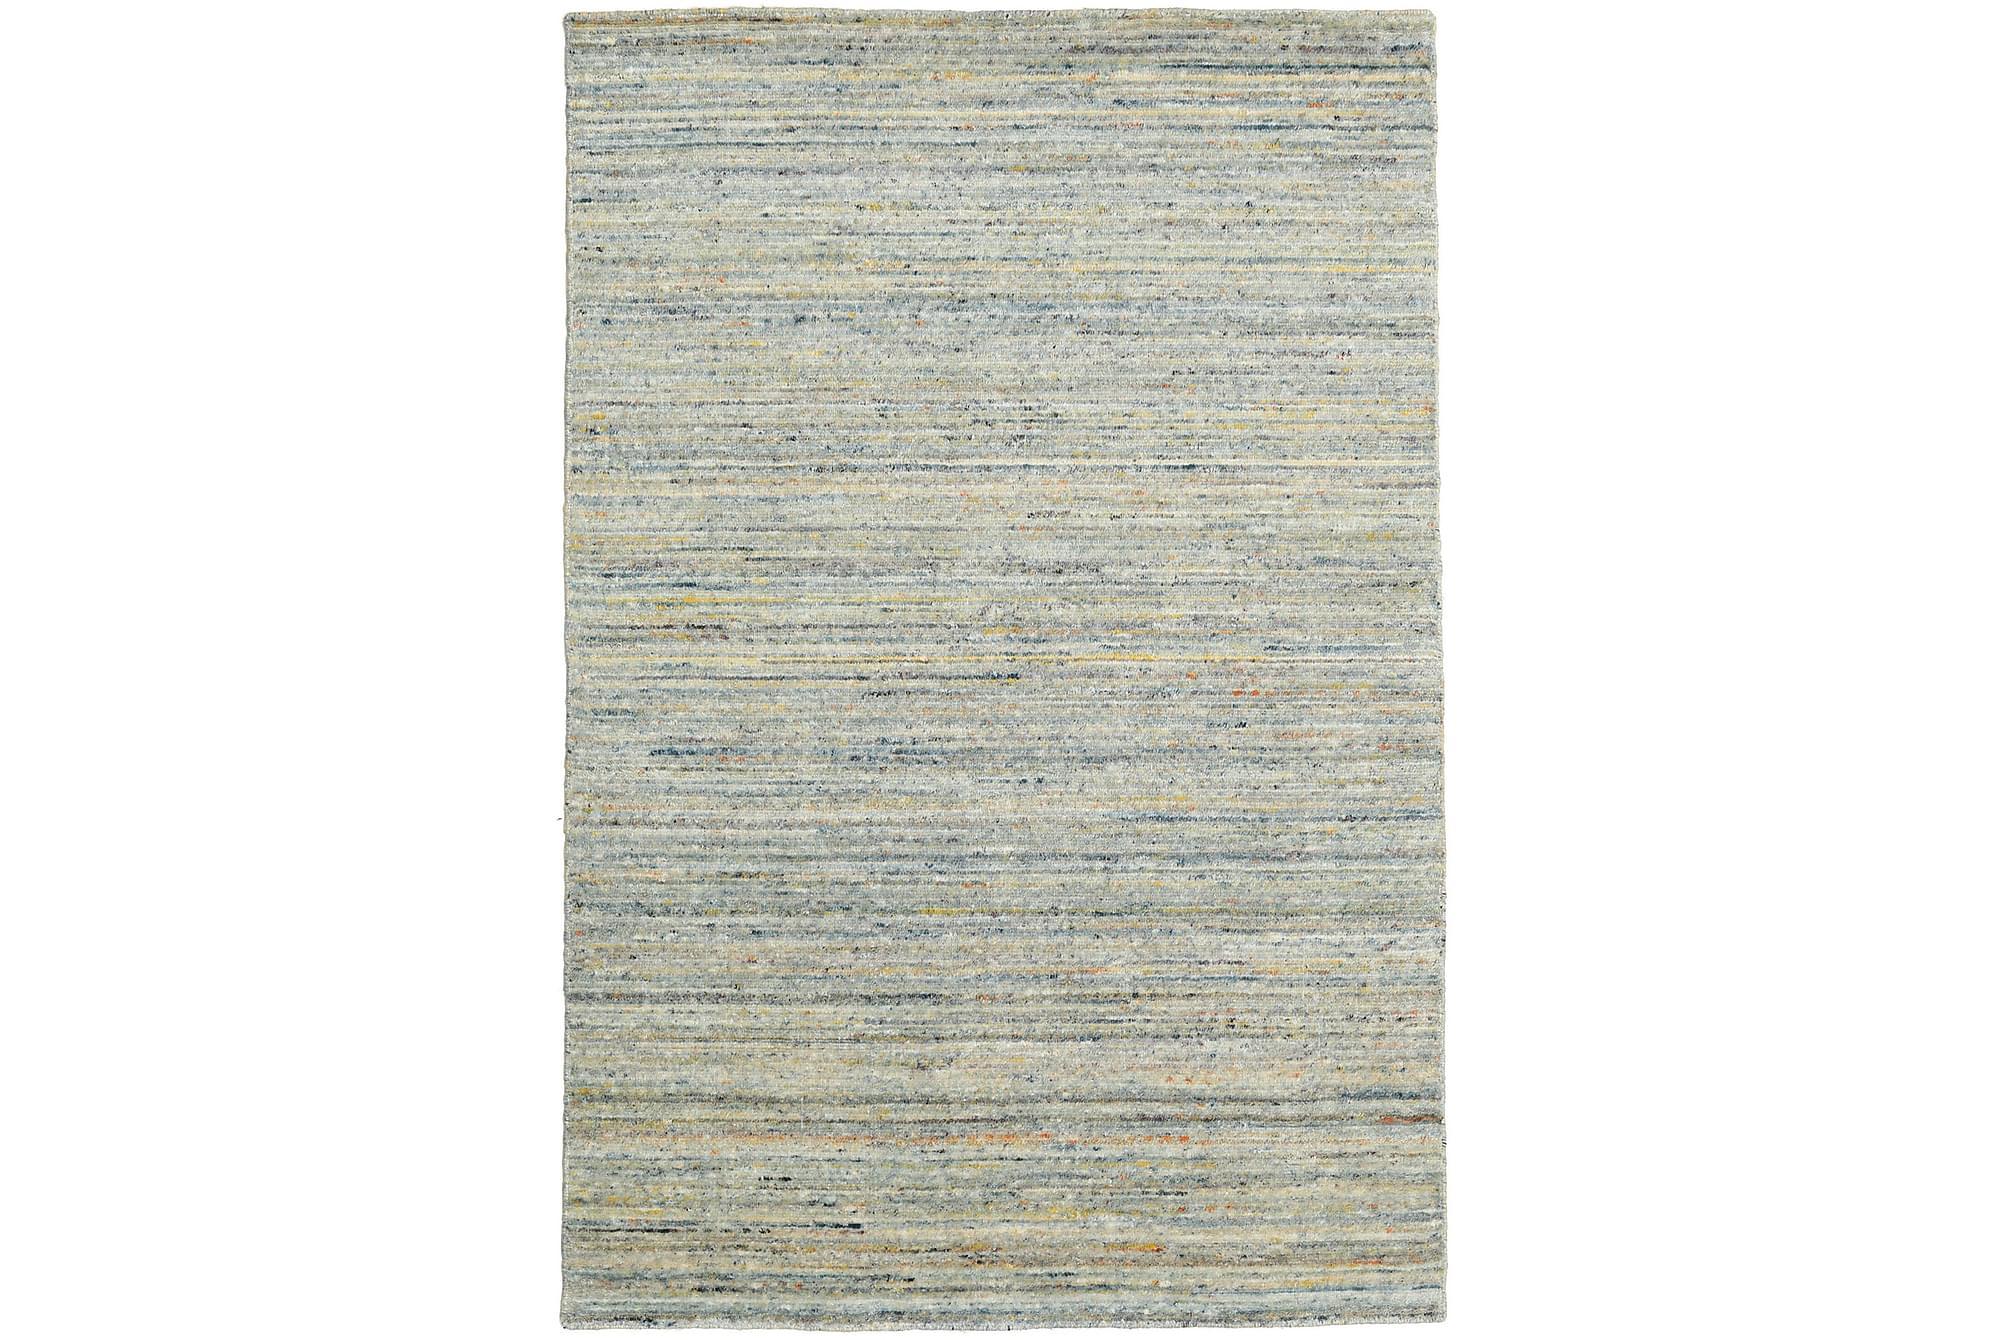 MAZIC Matta 120x180 cm, Enfärgade mattor